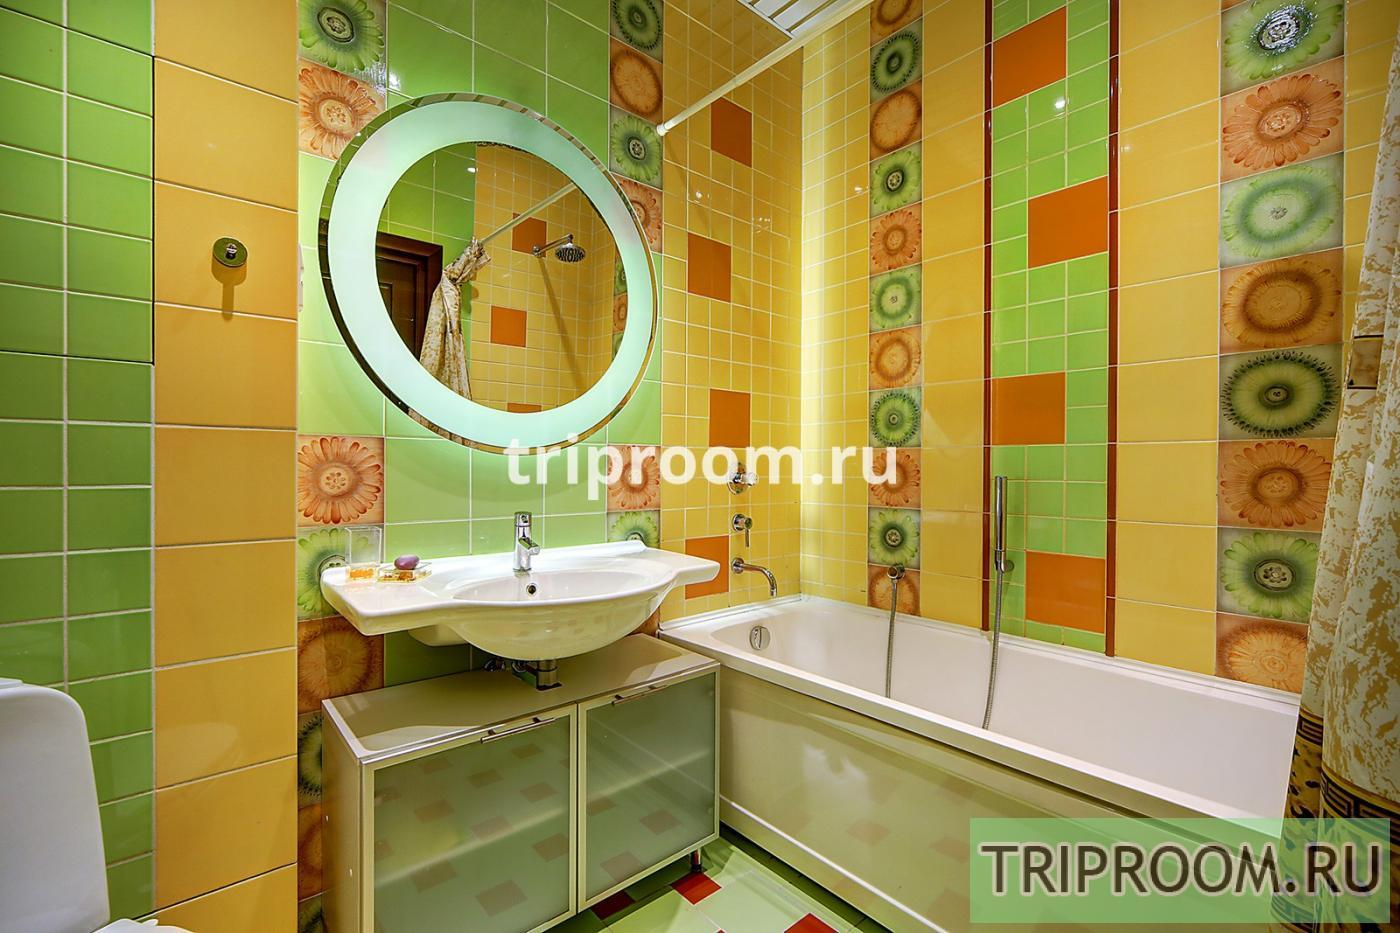 1-комнатная квартира посуточно (вариант № 15117), ул. Канала Грибоедова набережная, фото № 13